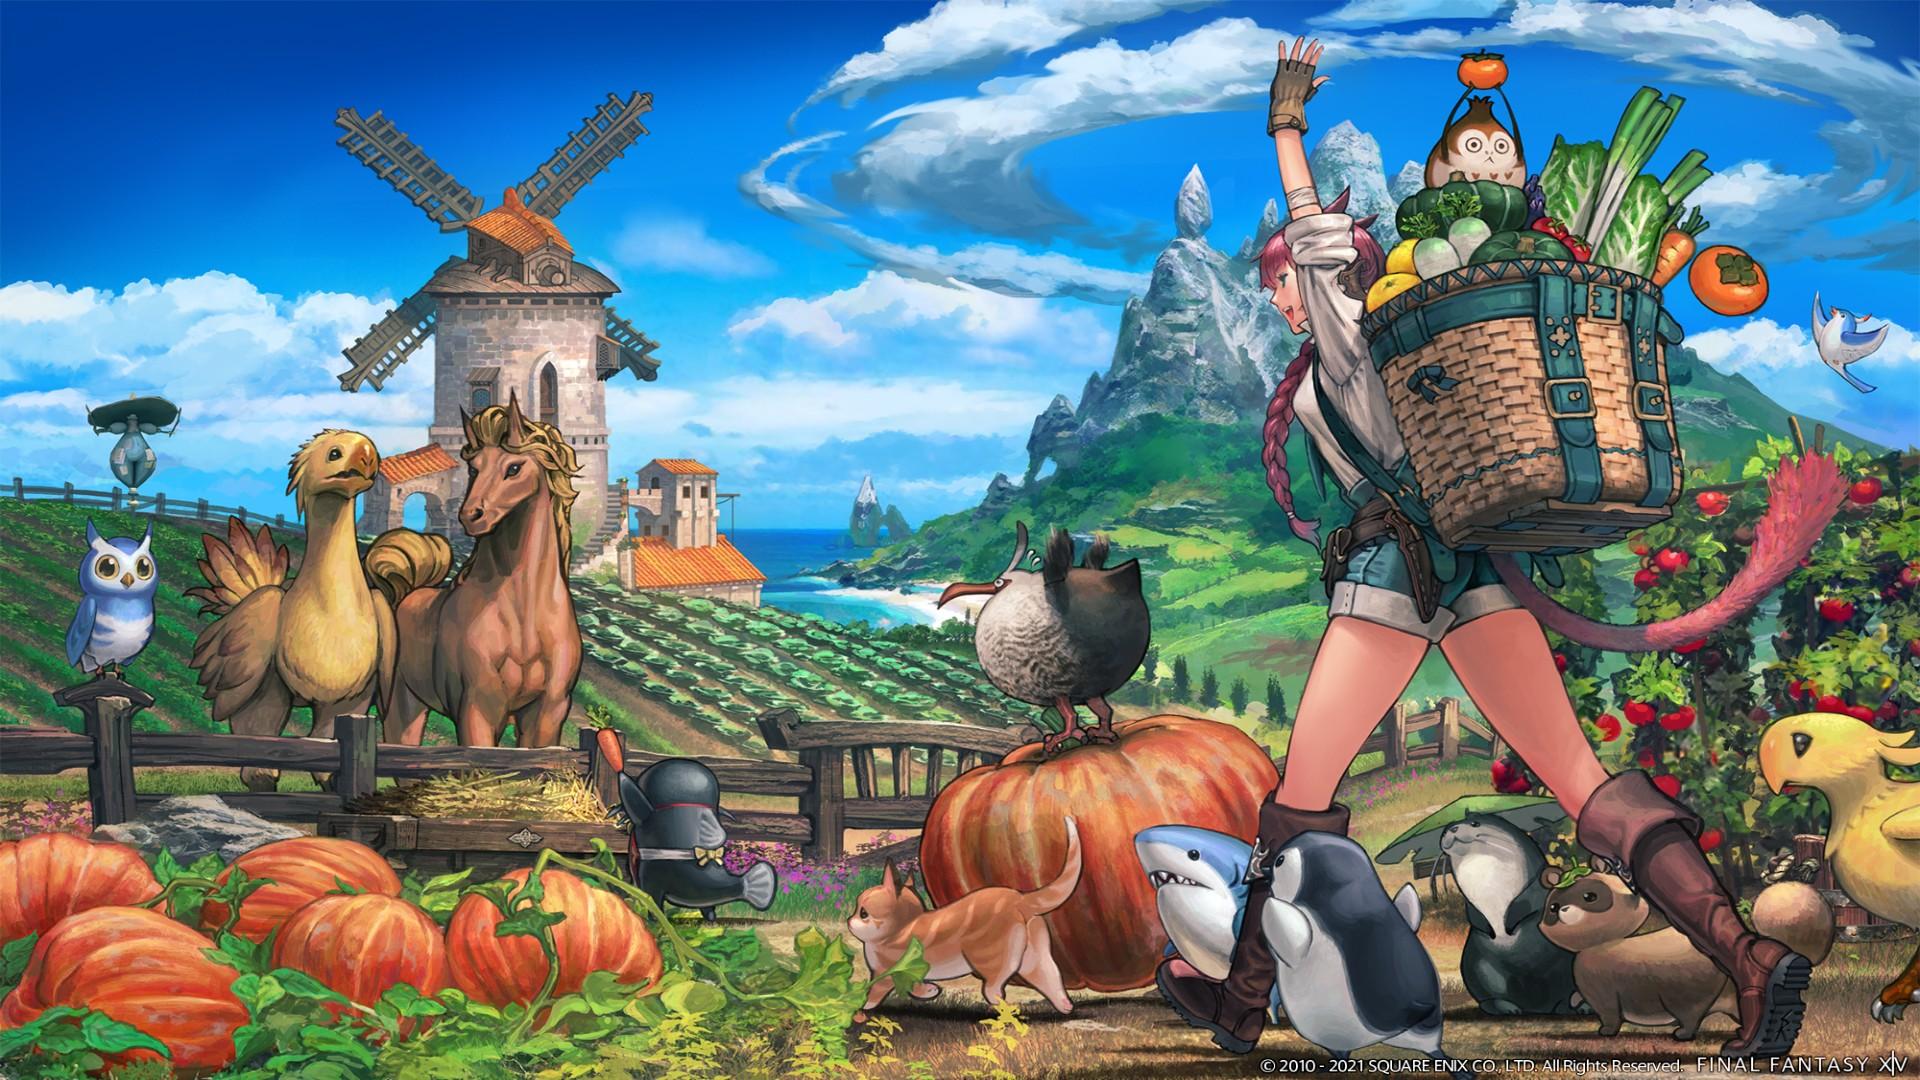 Final Fantasy 14 Island Sanctuary